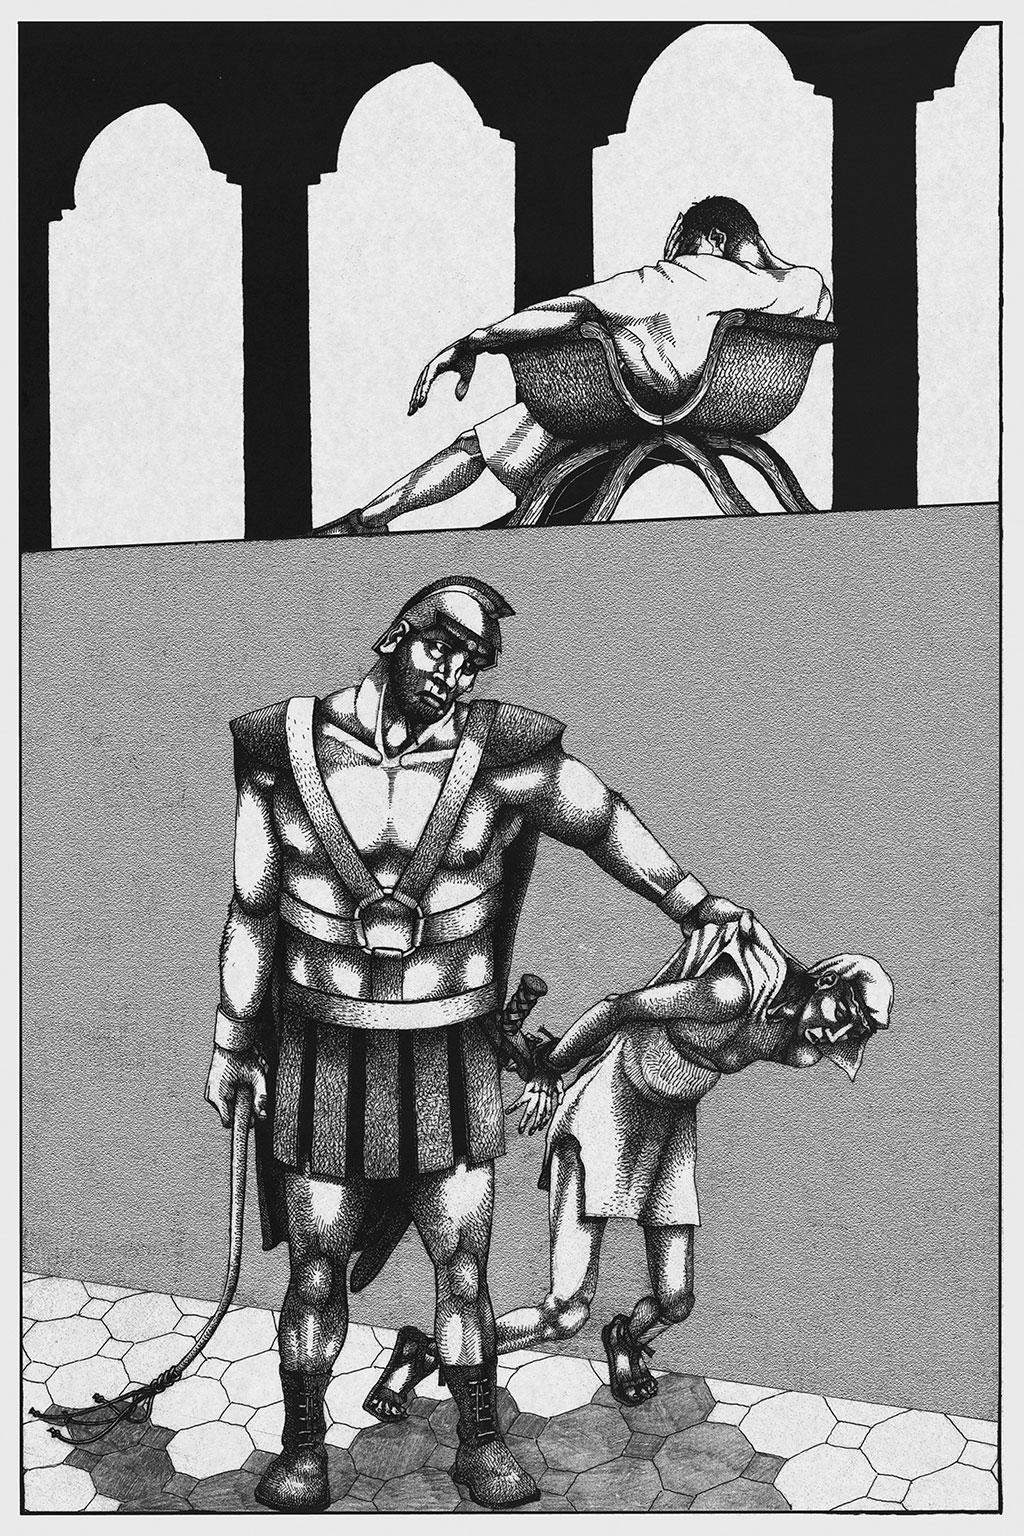 Иллюстрация Мастер и Маргарита Чарли Стоун 2